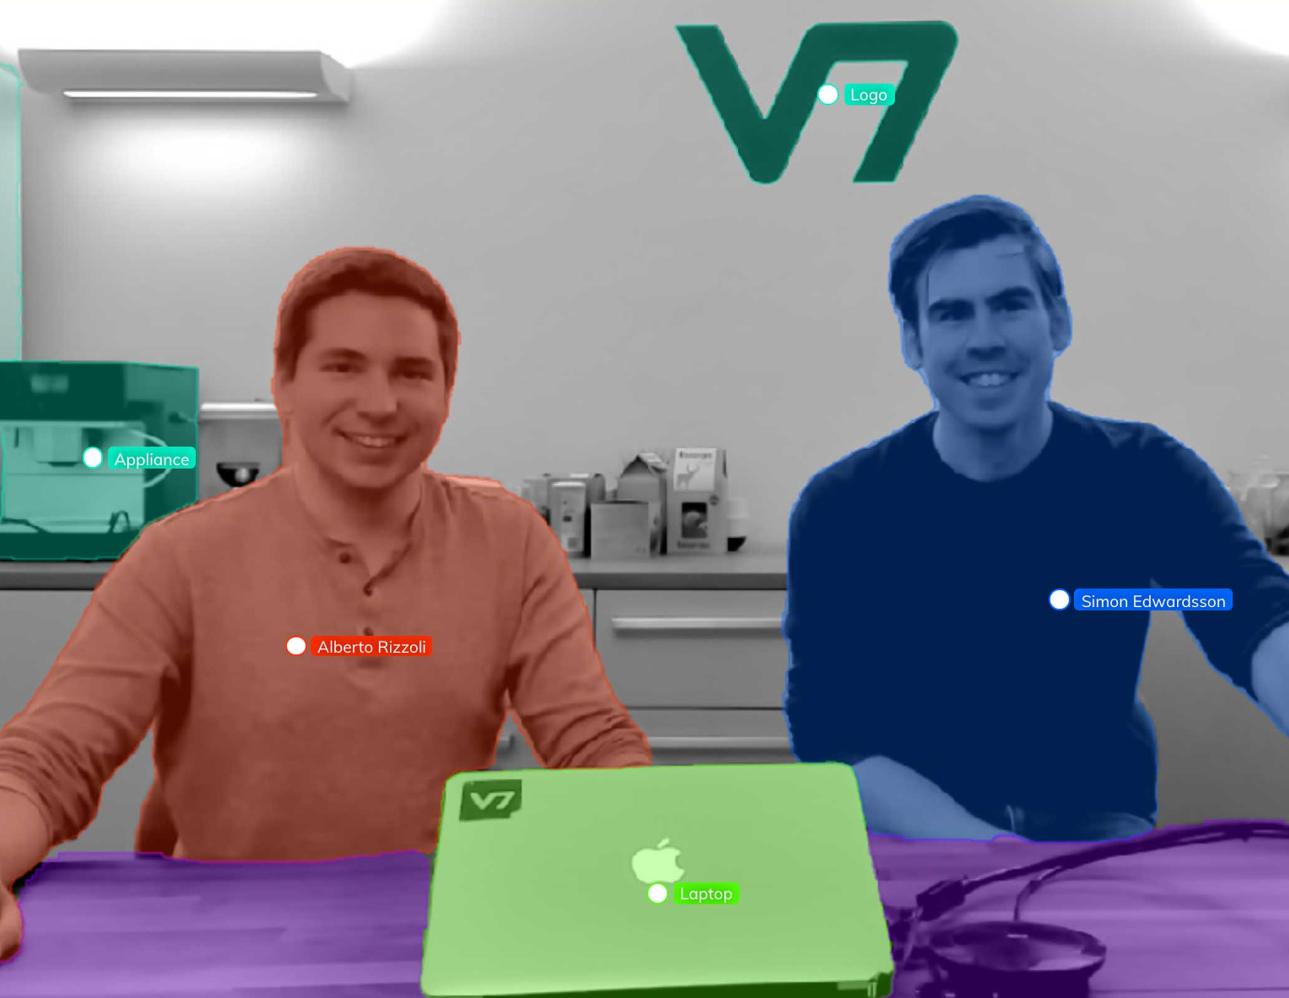 V7 Labs founders - Alberto Rizzoli and Simon Edwardsson